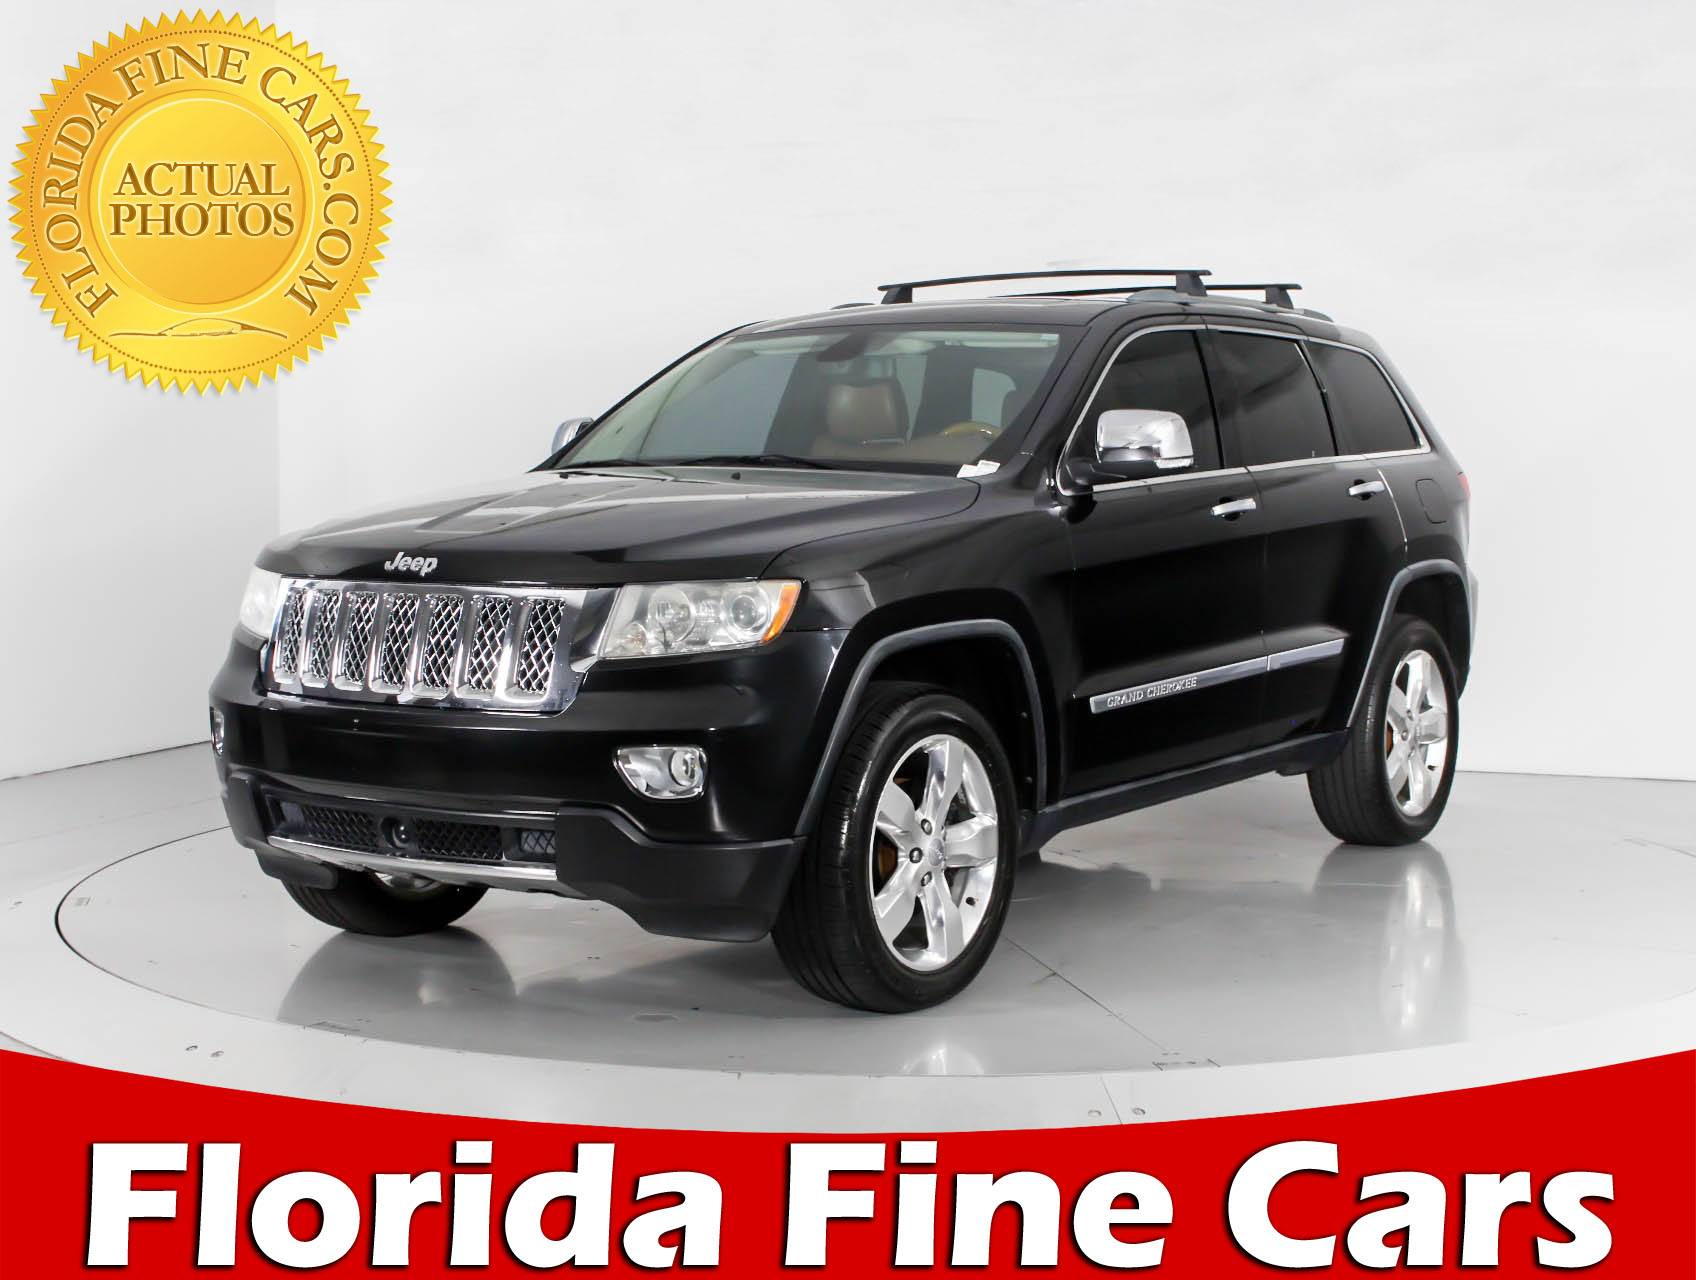 cherokee sale grand overland san in new jeep antonio for